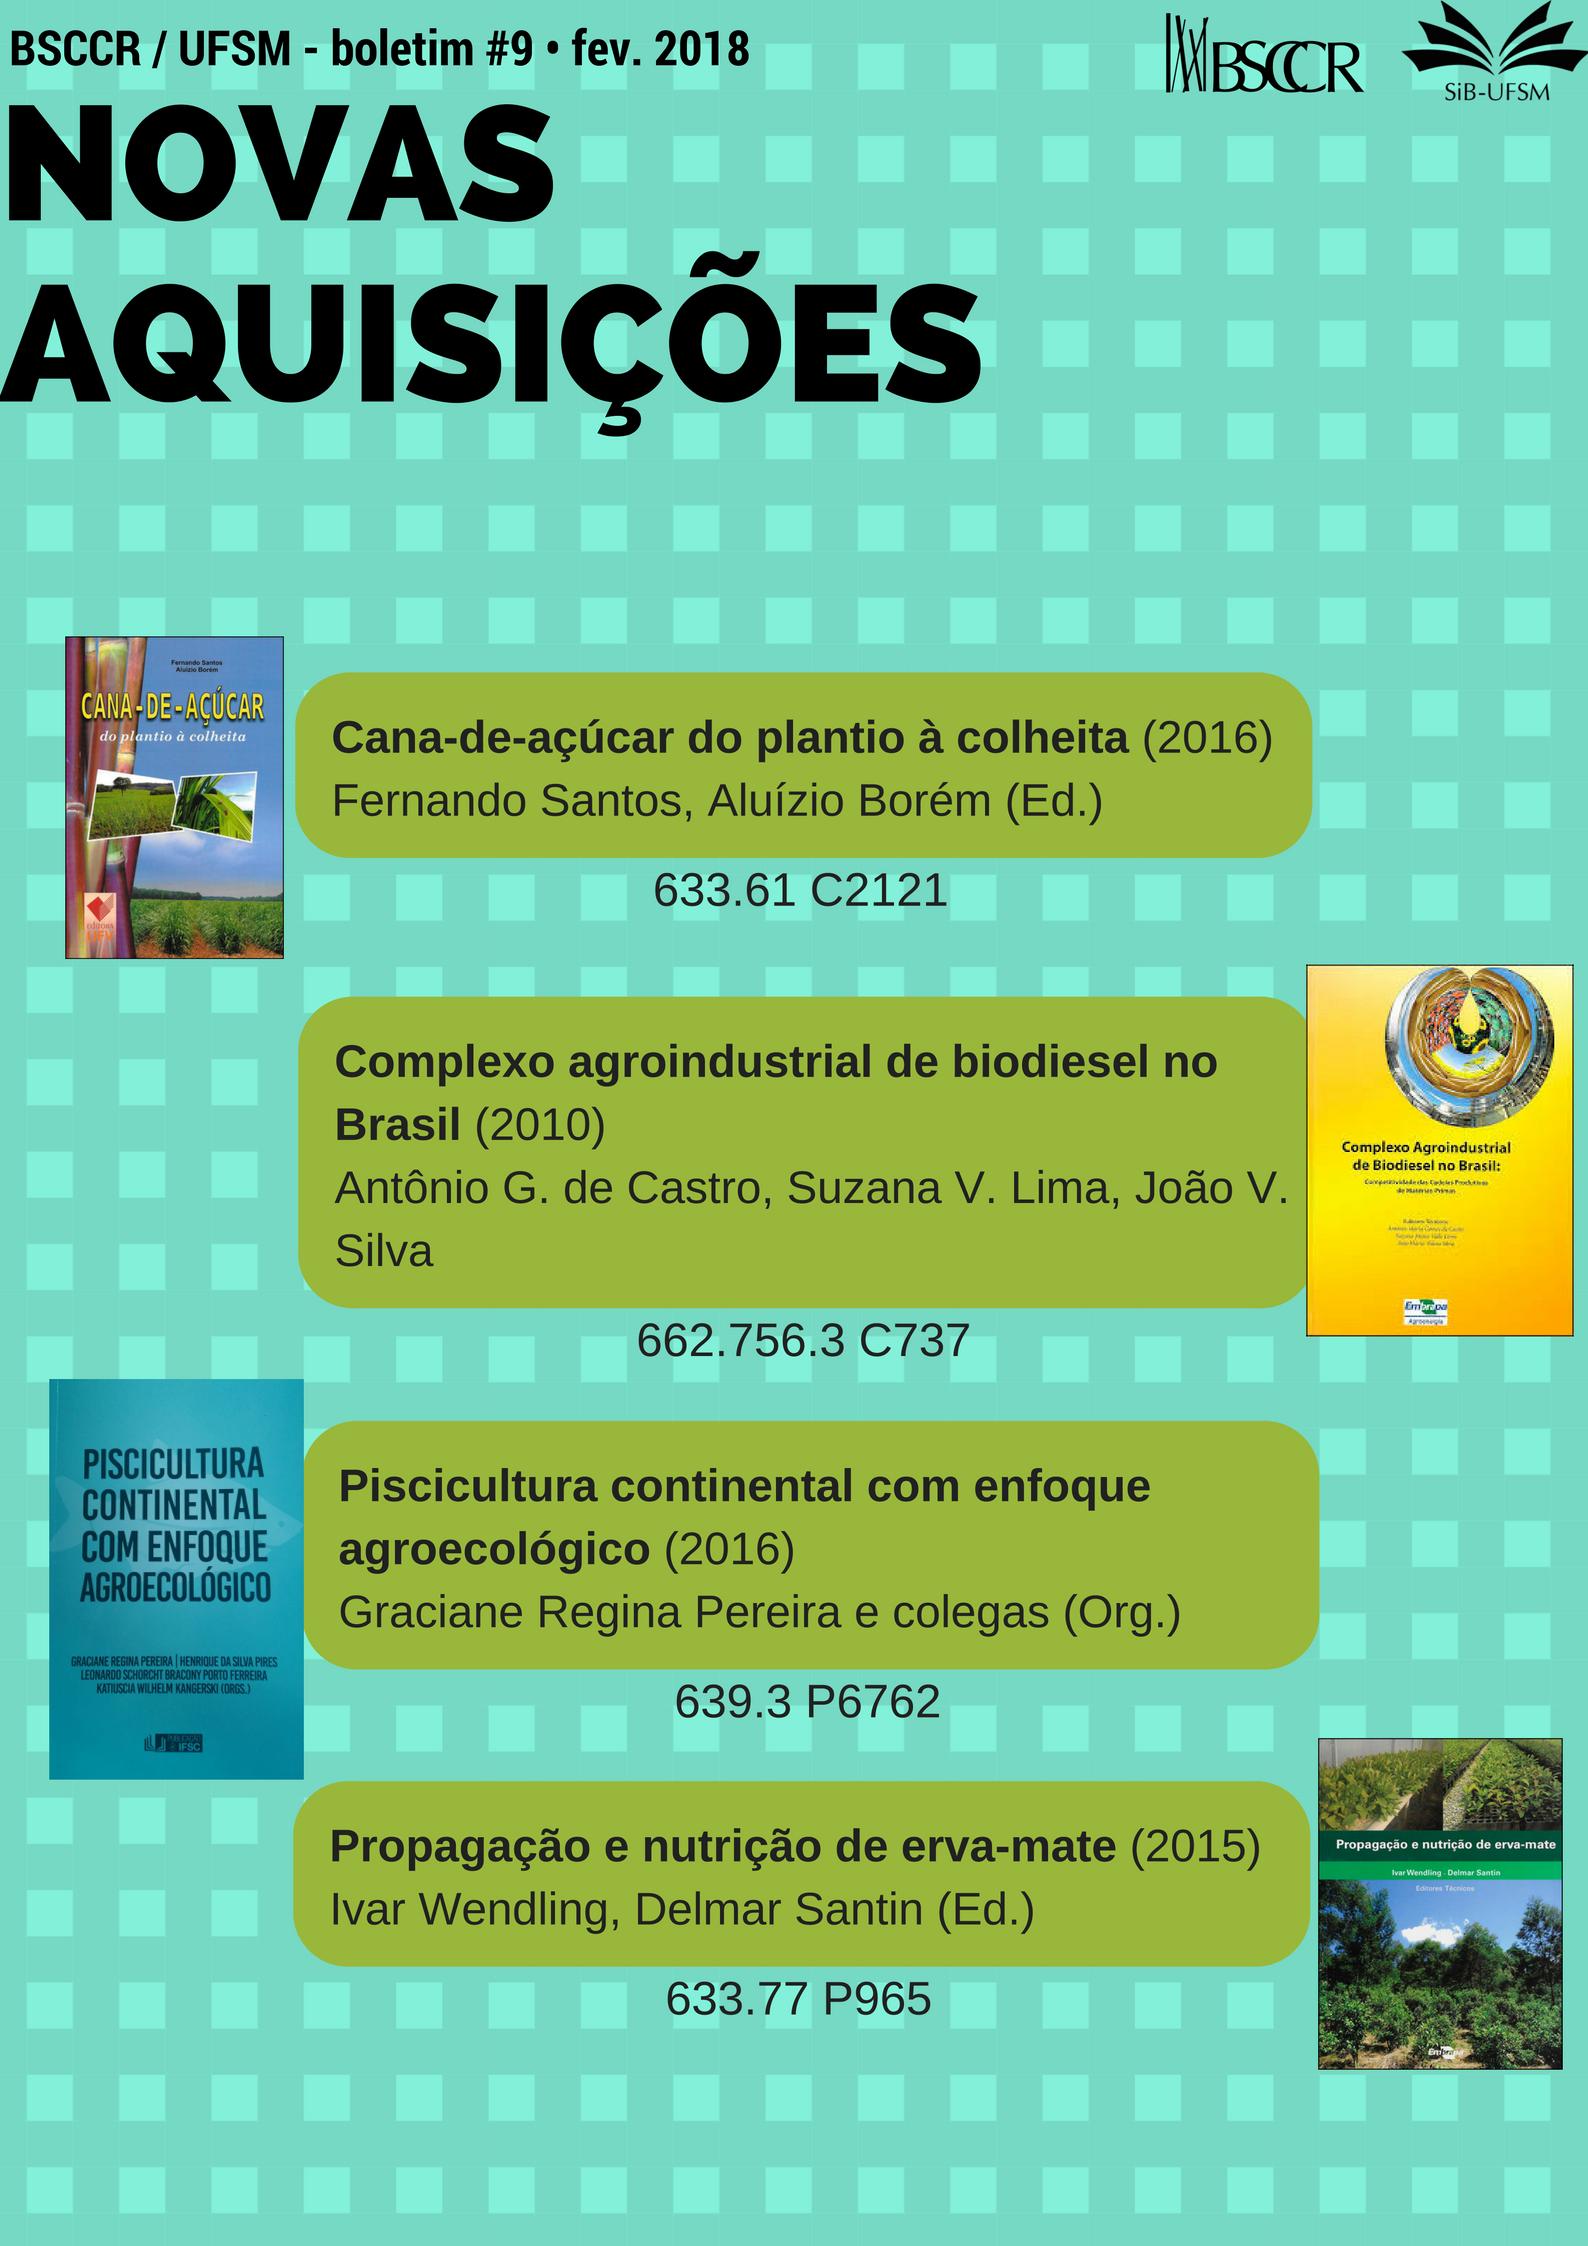 BSCCRnovasaquisicoes2018 02